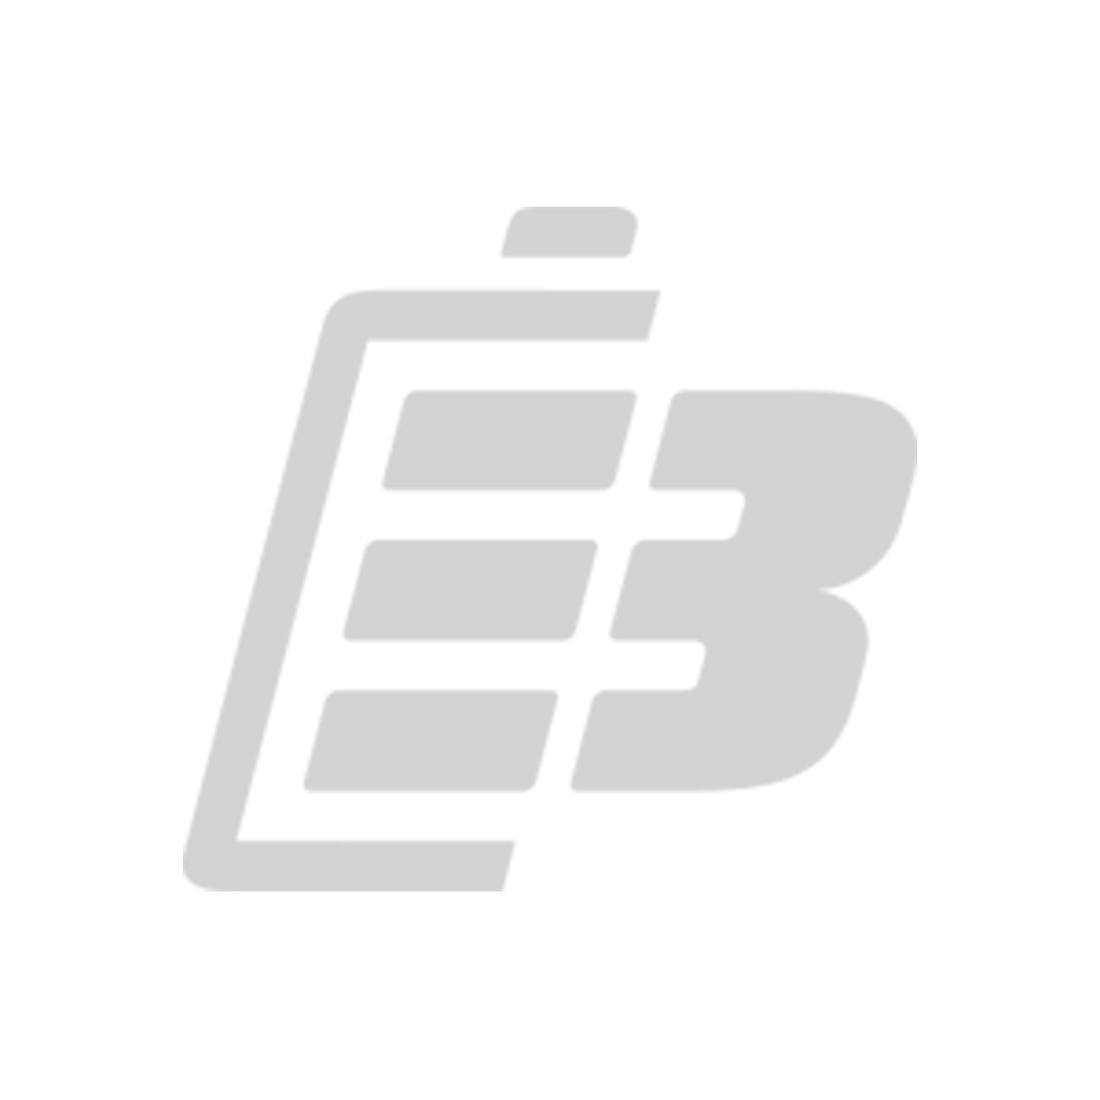 Cordless phone battery Bang & Olufsen Beocom 2_1